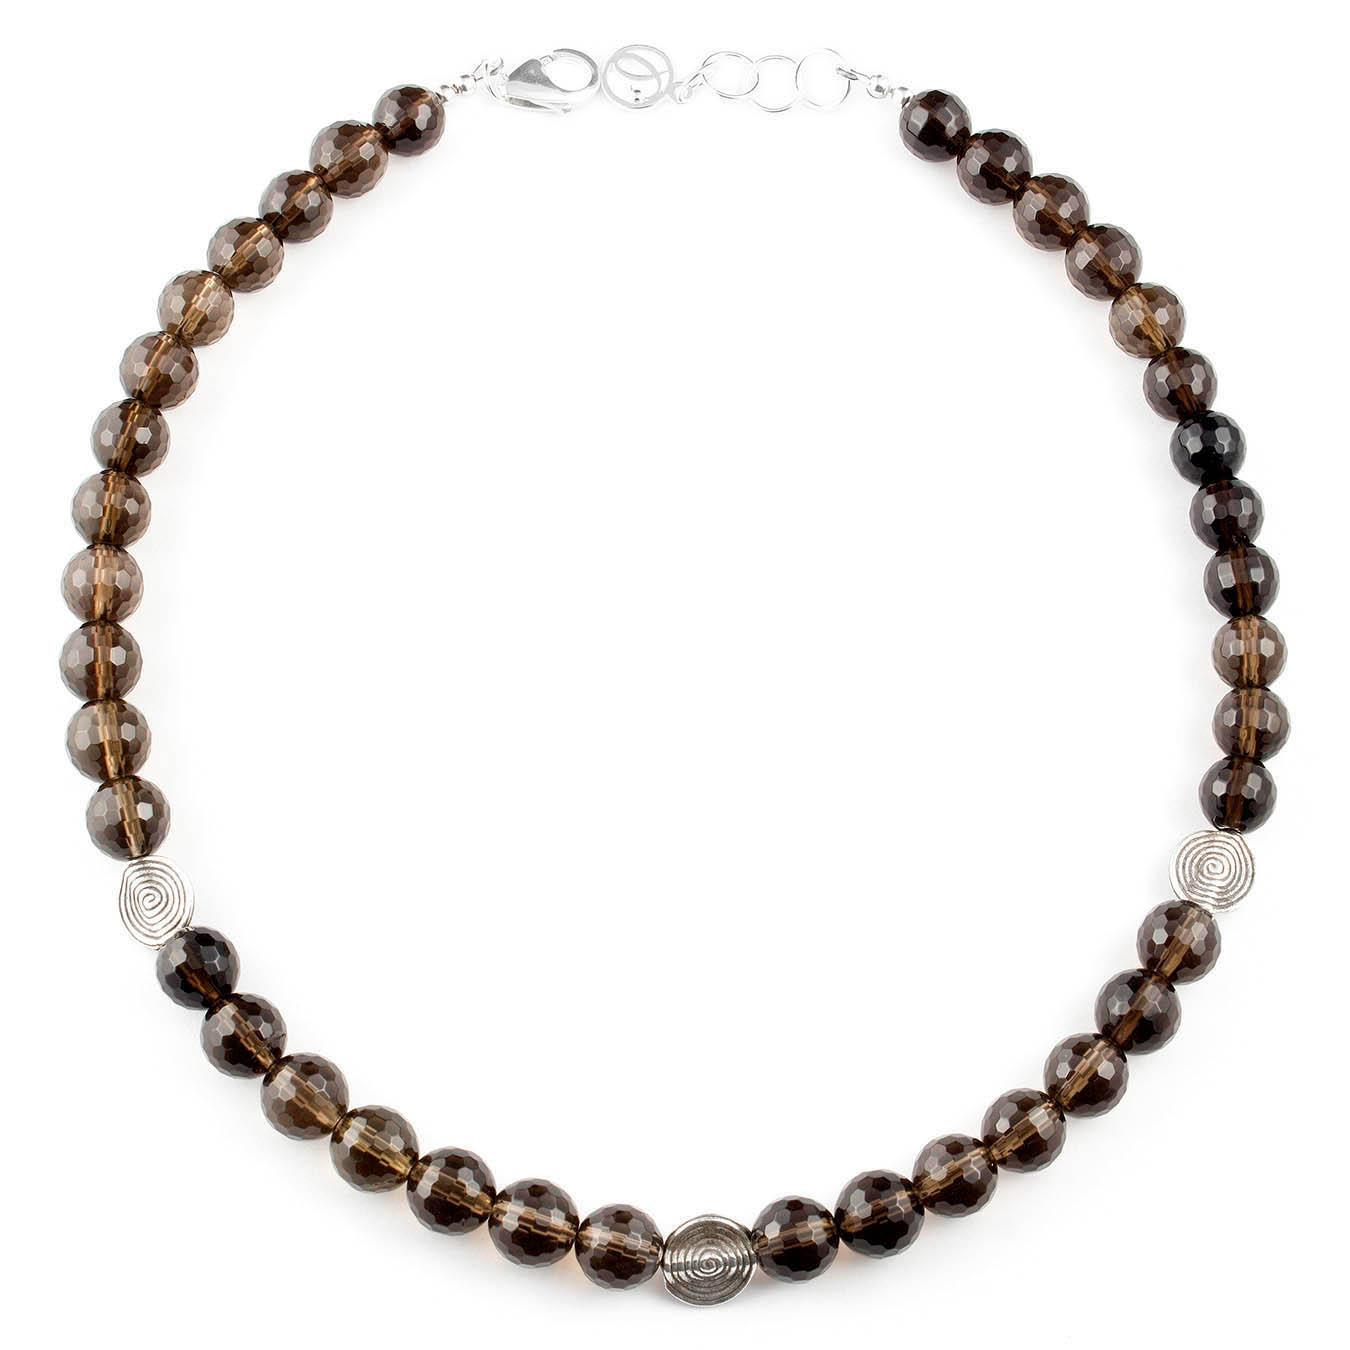 Station necklace set made of smoky quartz and karen hill tribe silver